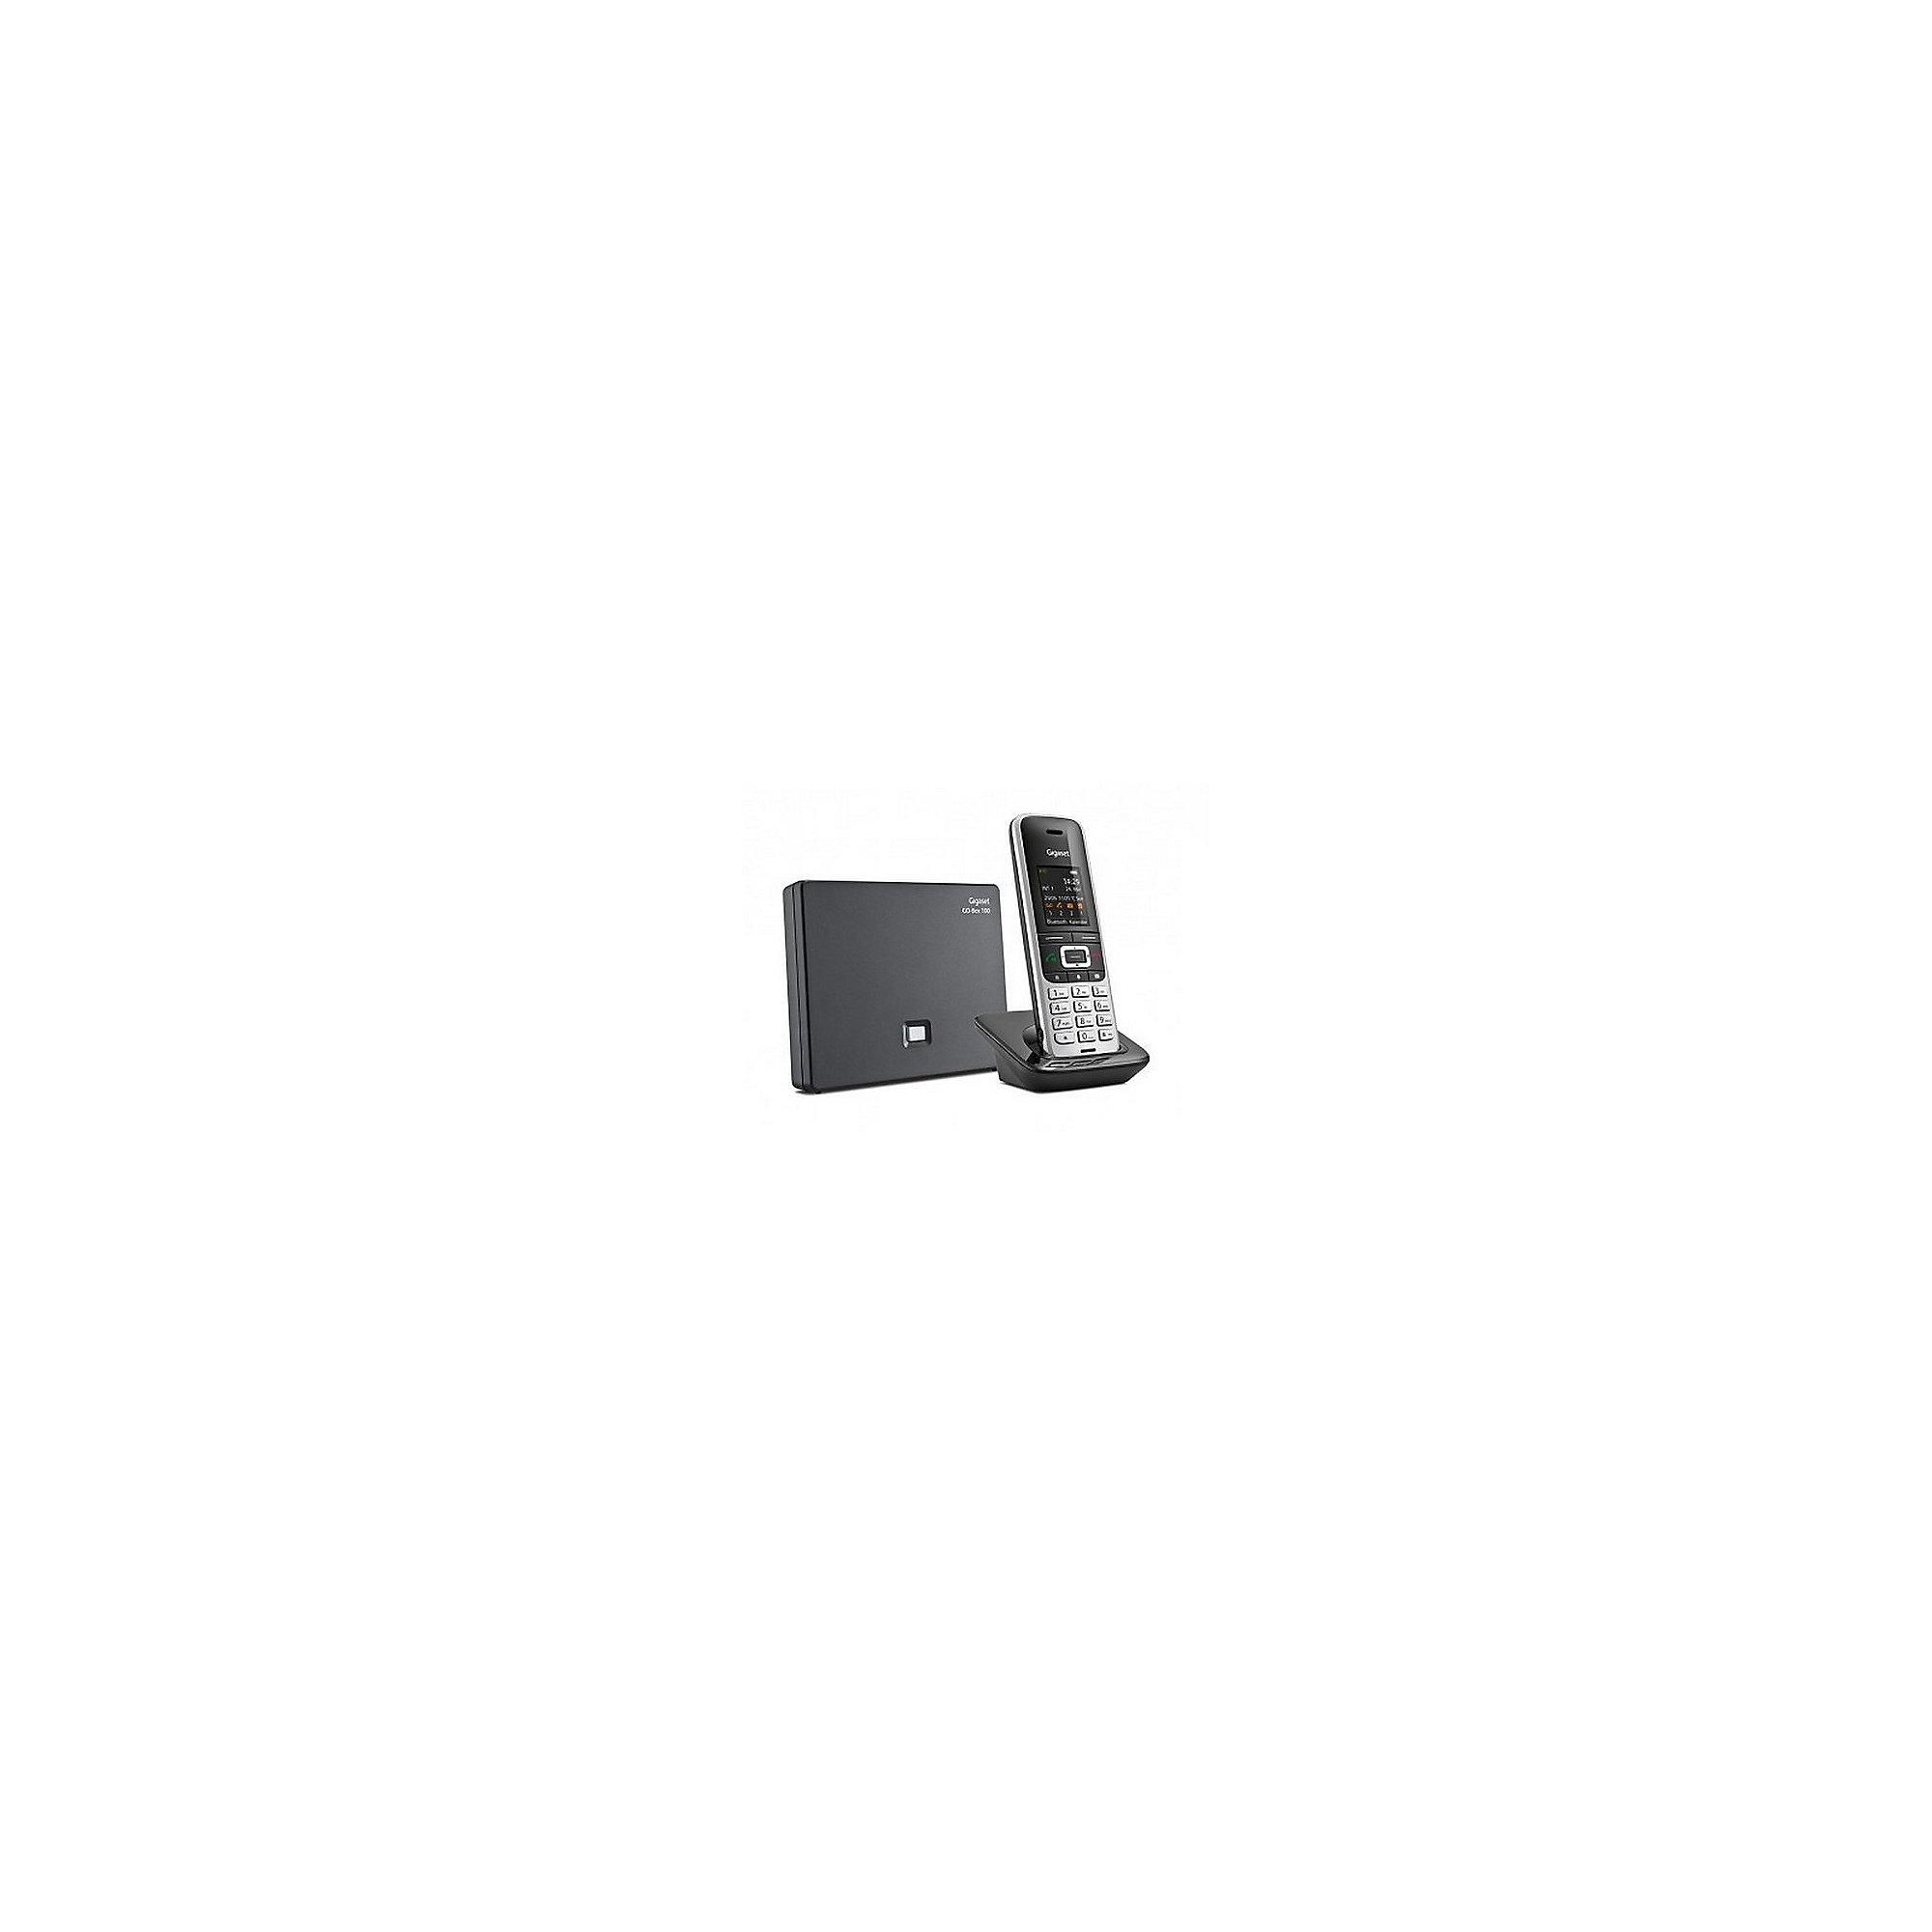 gigaset s850a go festnetztelefon ab pc anschluss analog. Black Bedroom Furniture Sets. Home Design Ideas